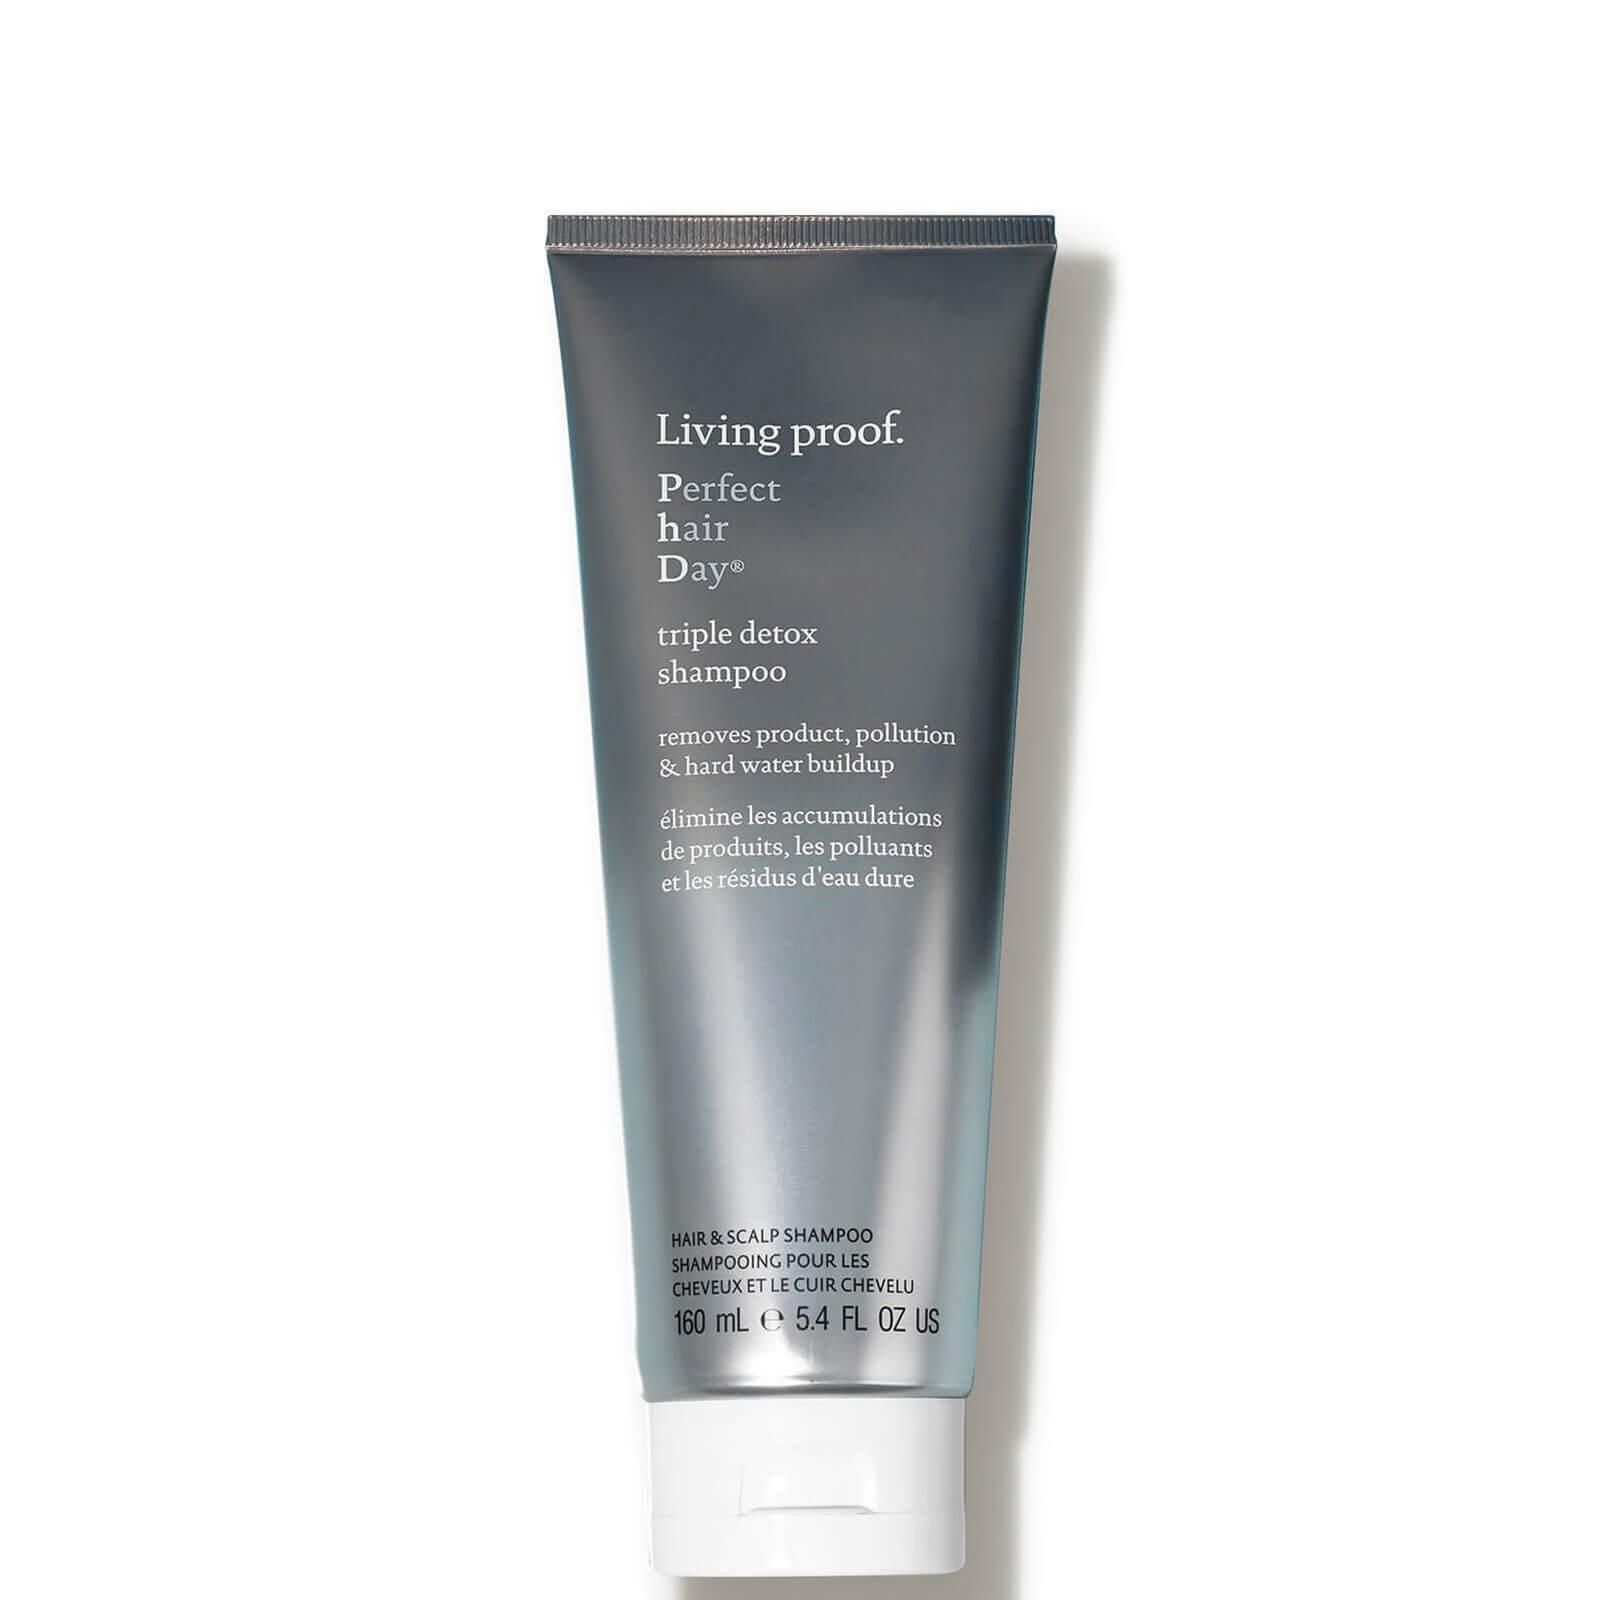 Купить Living Proof Perfect Hair Day (PhD) Triple Detox Shampoo 160ml